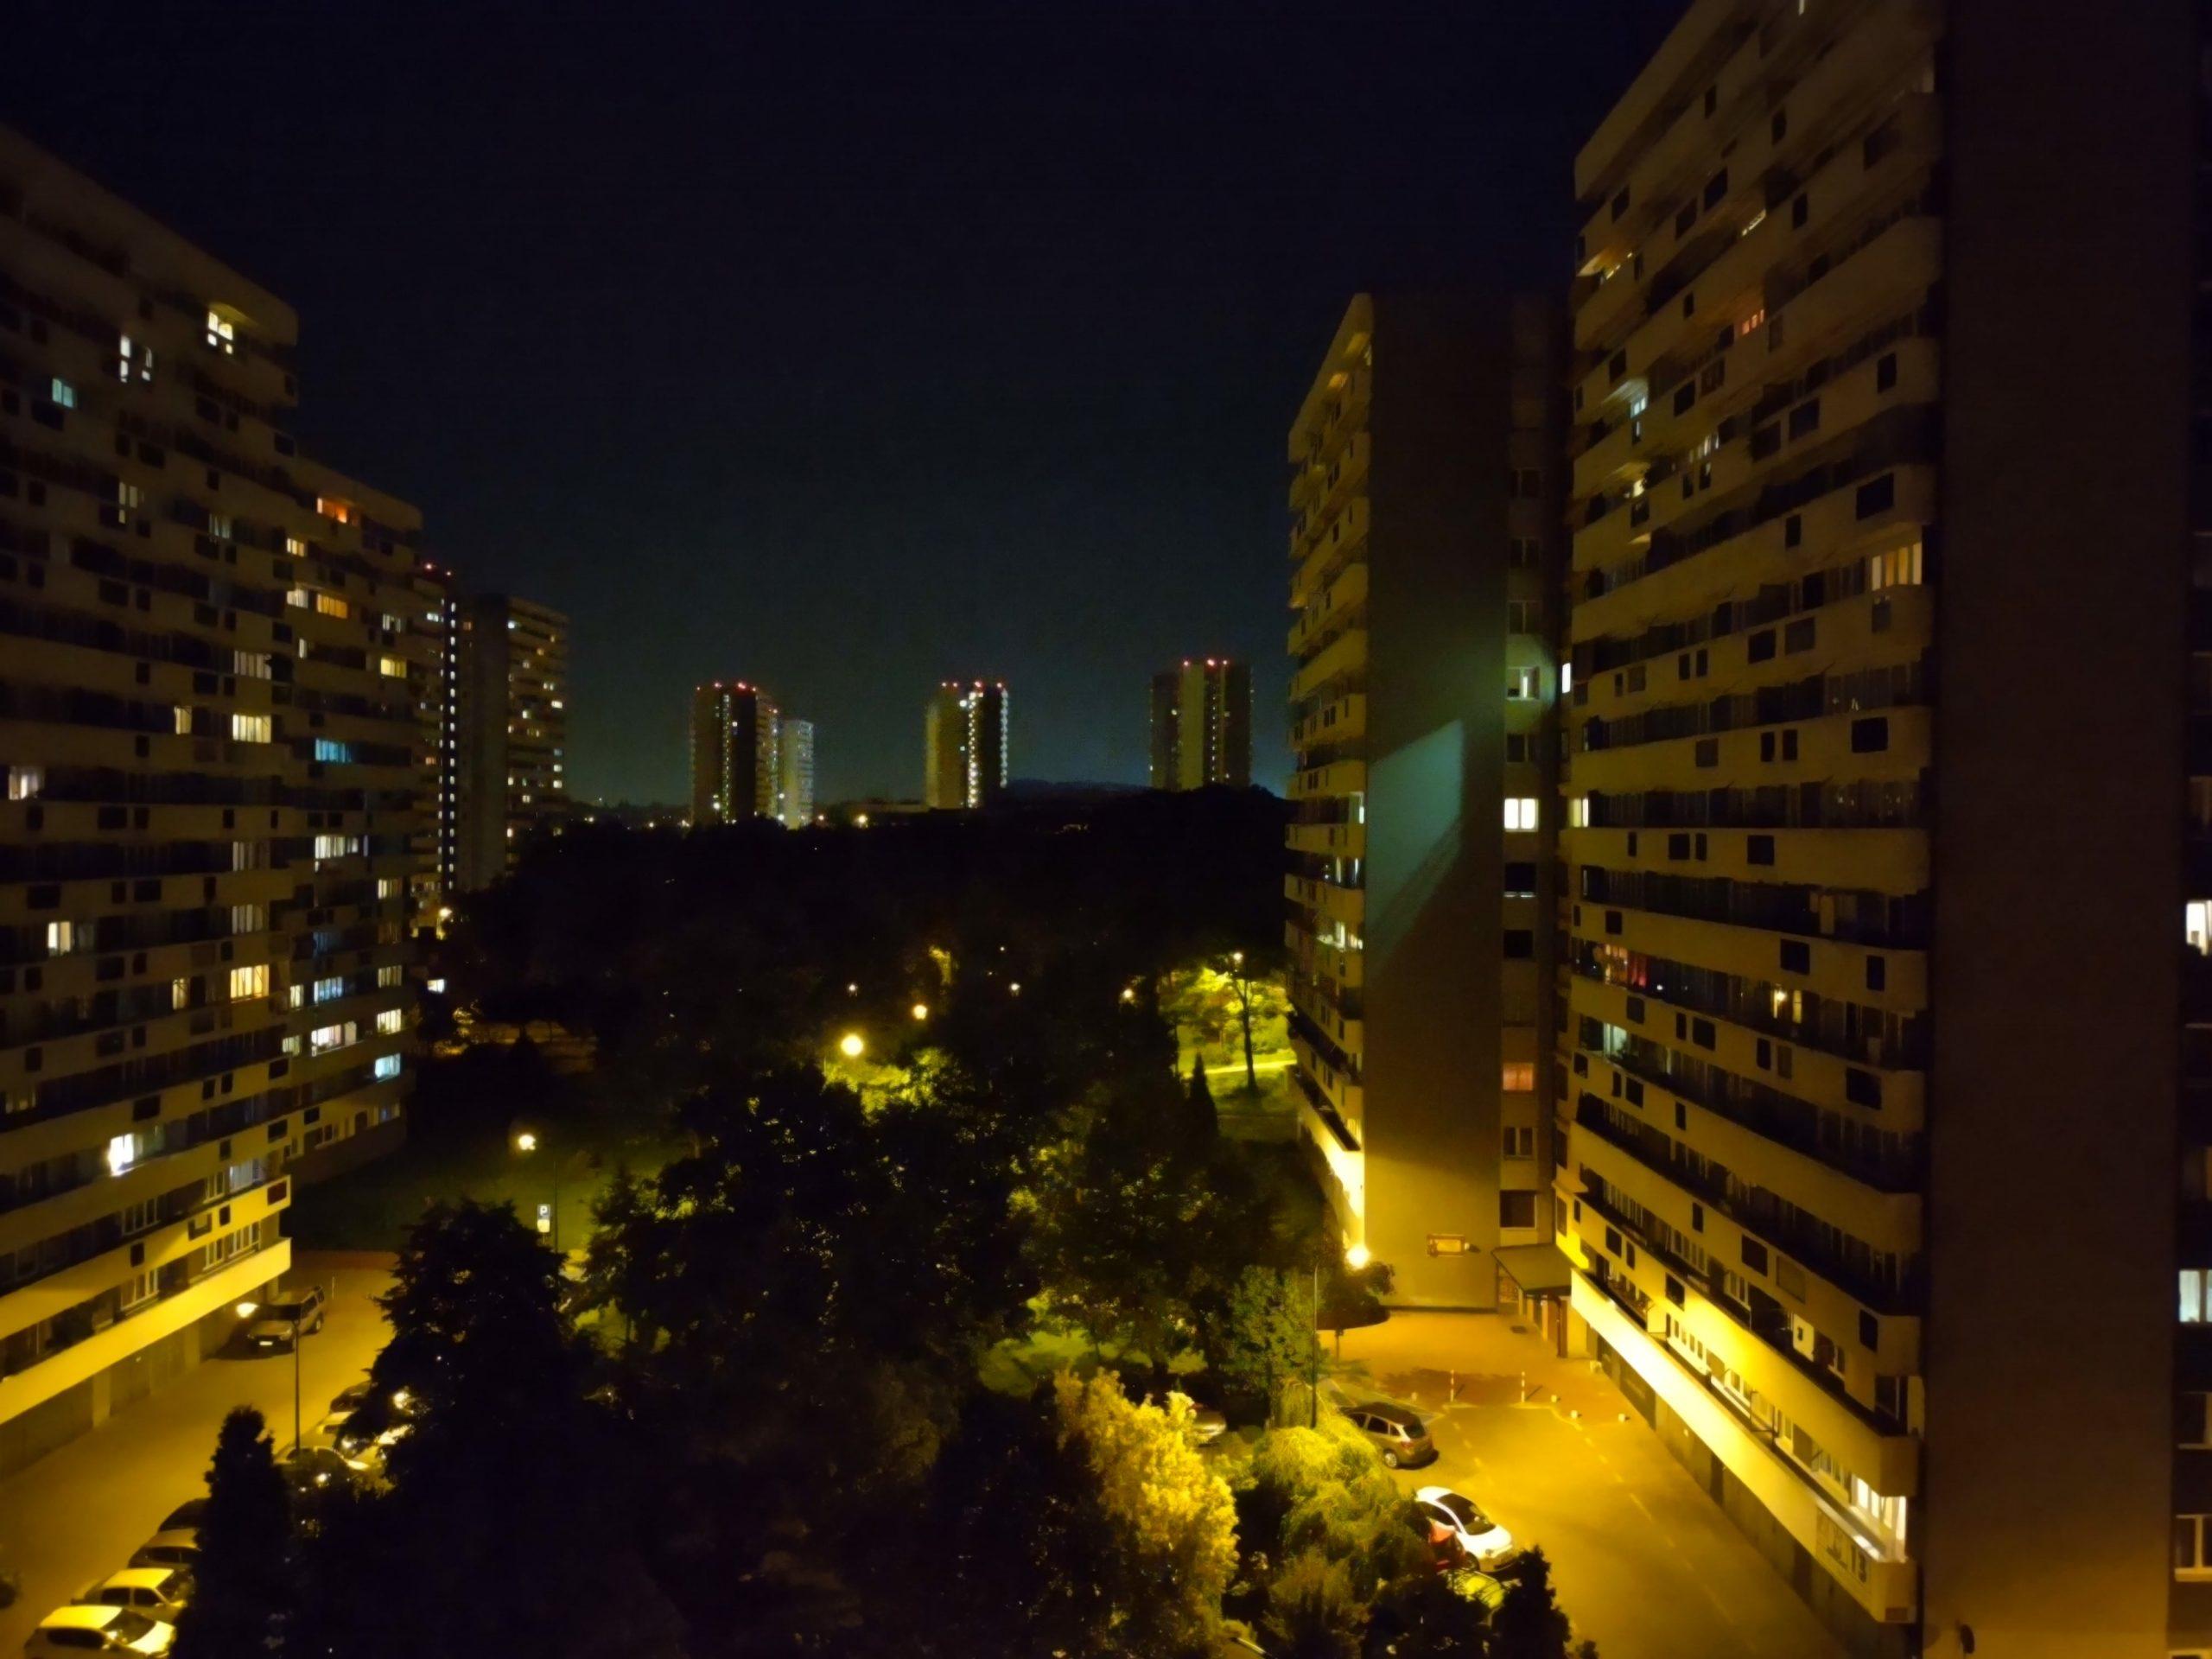 Zdjęcia nocne - Motorola Moto G 5G Plus